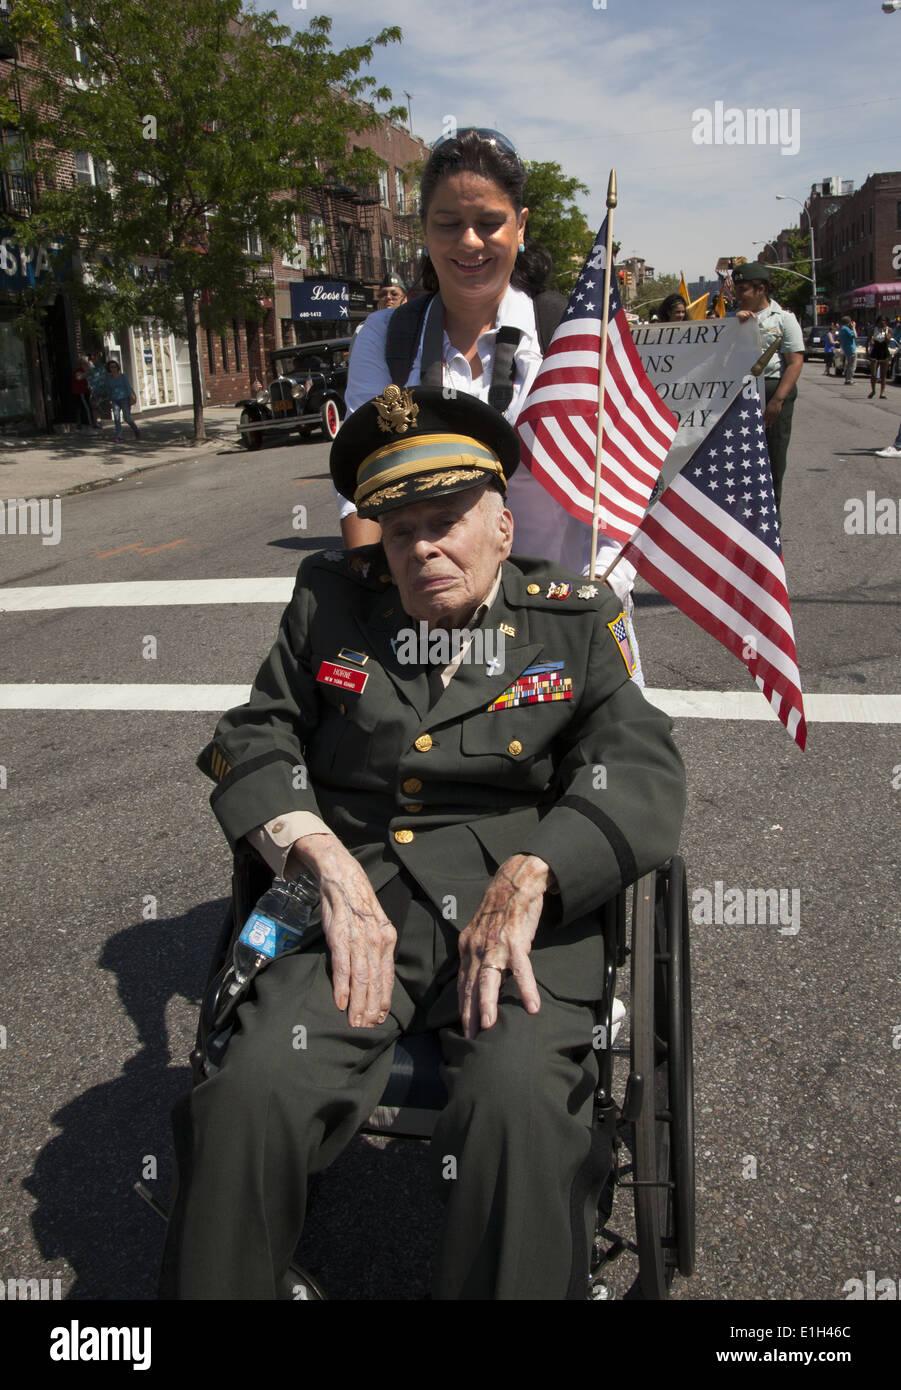 2014 Memorial Day Parade, Bay Ridge, Brooklyn. 92 yr old US WW ll Vet who landed at Omaha Beach, Normandy. - Stock Image